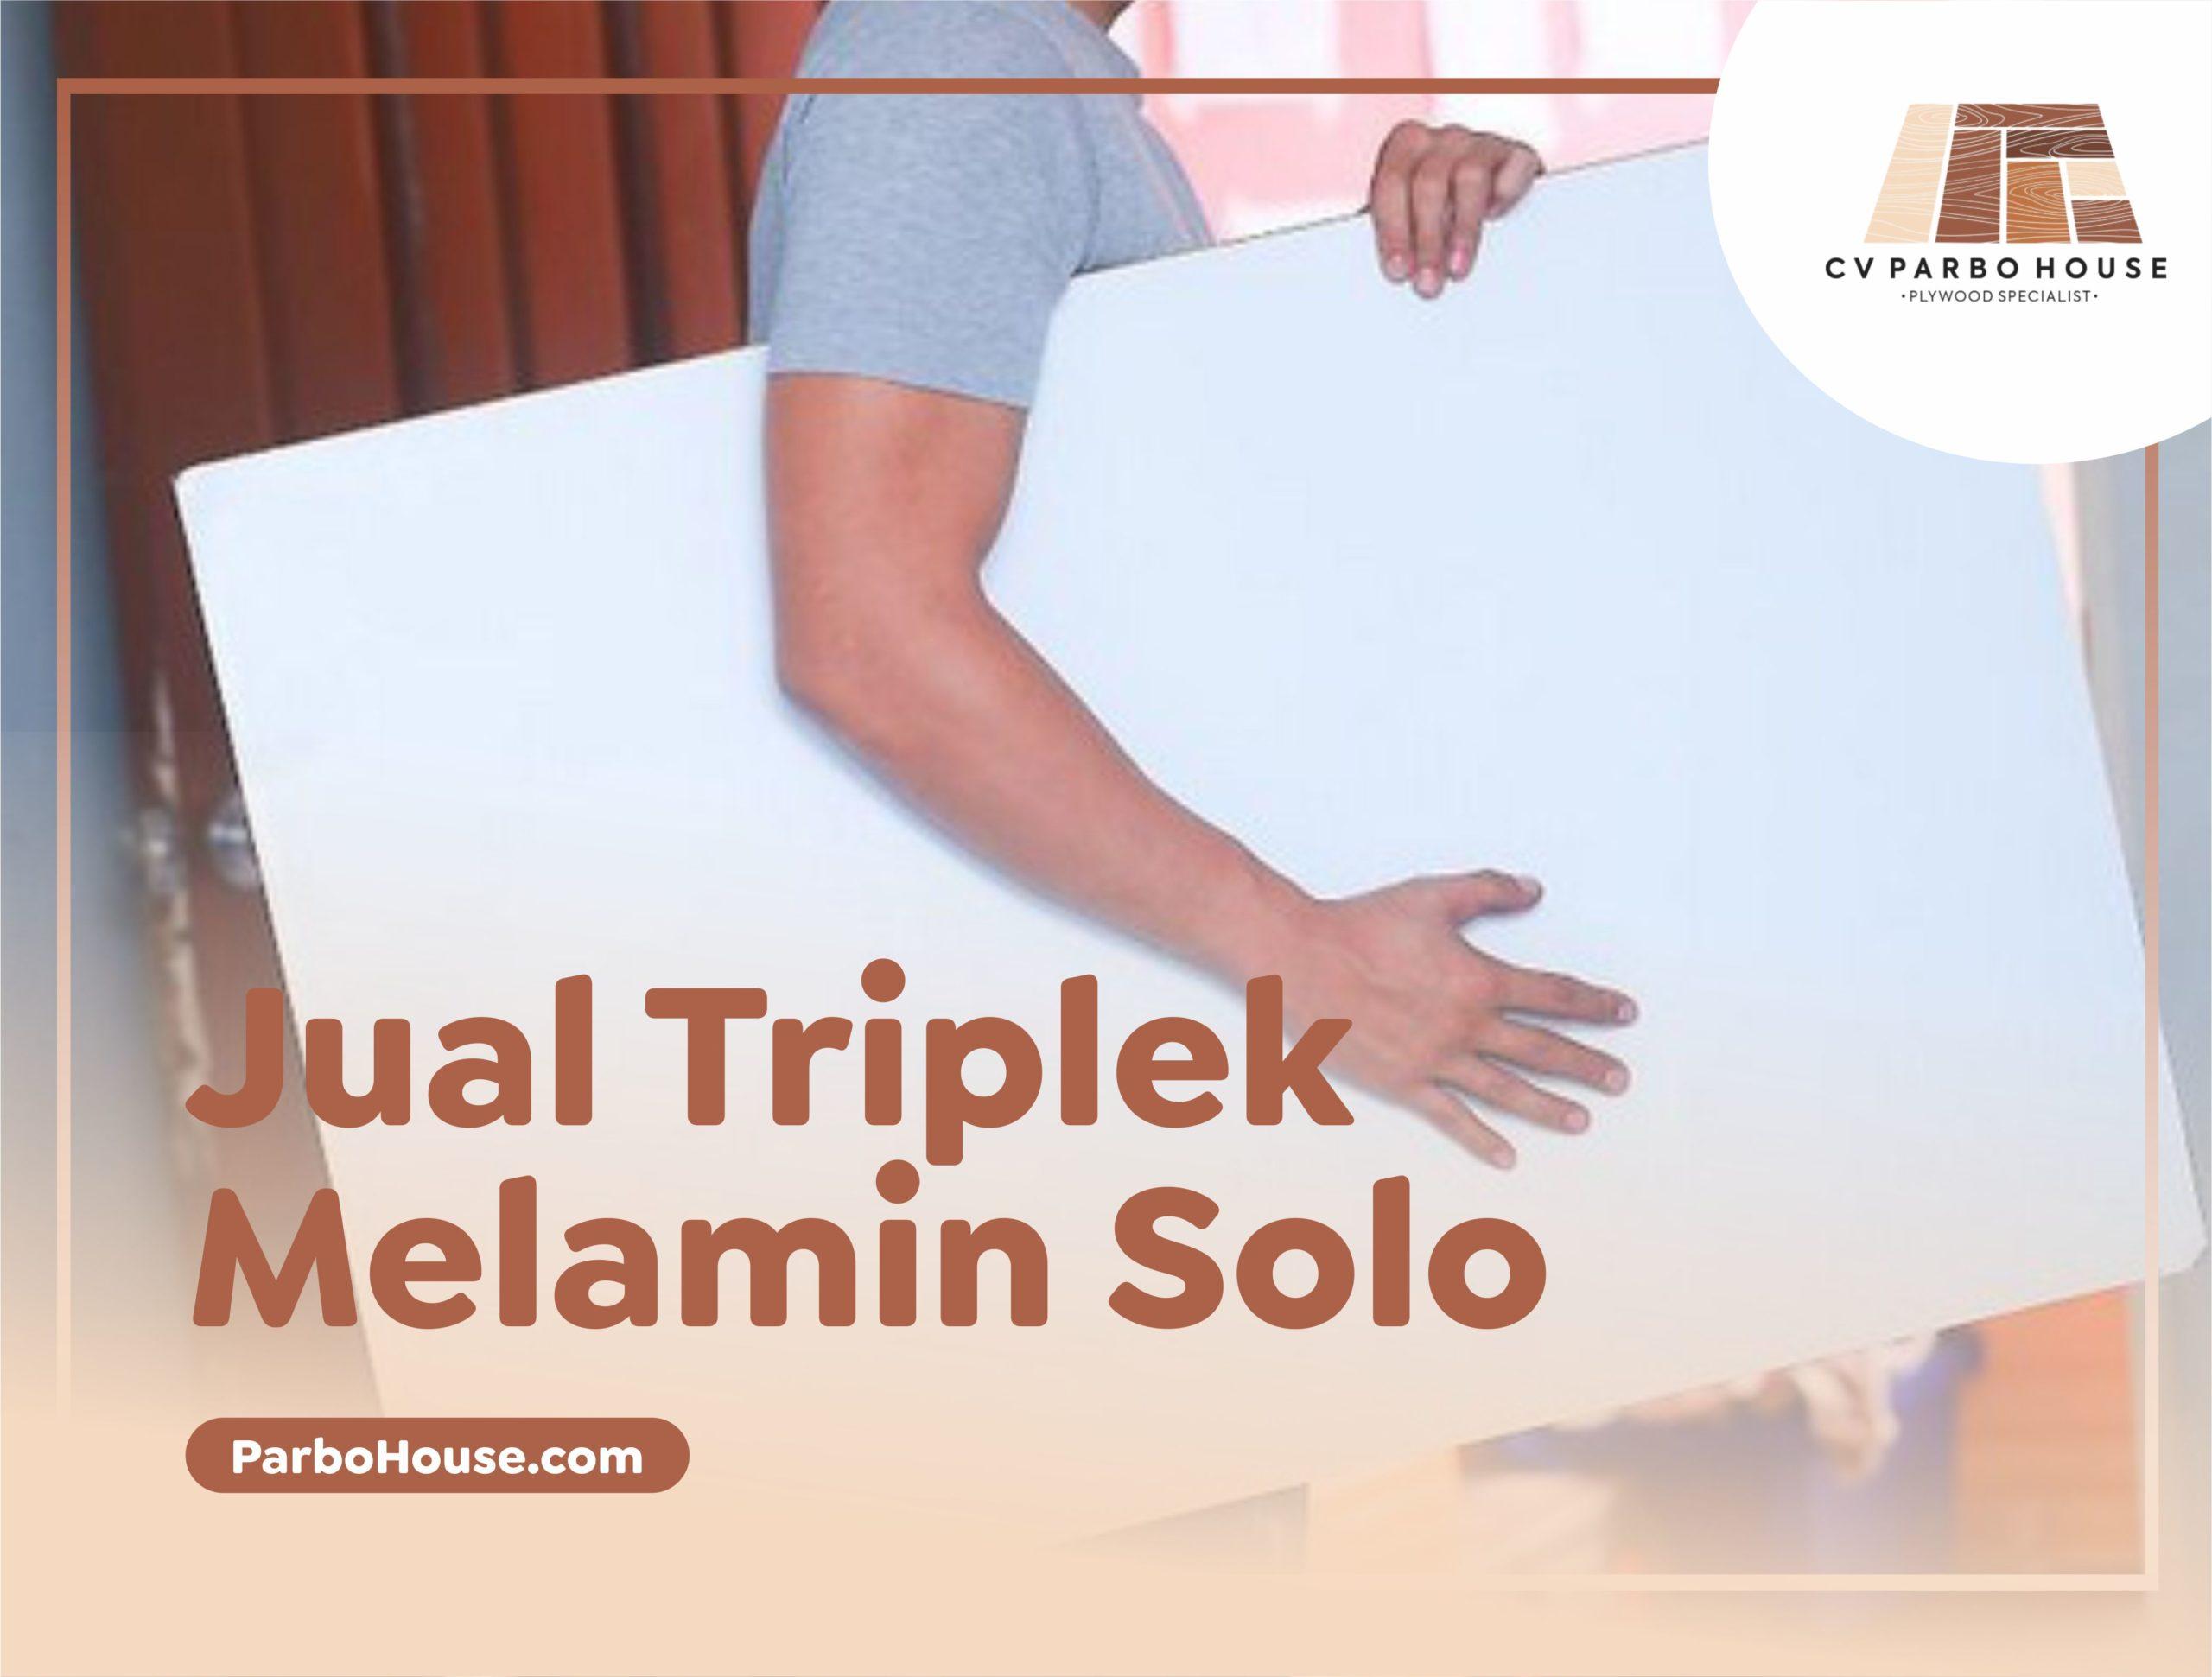 Jual Triplek Melamin Solo